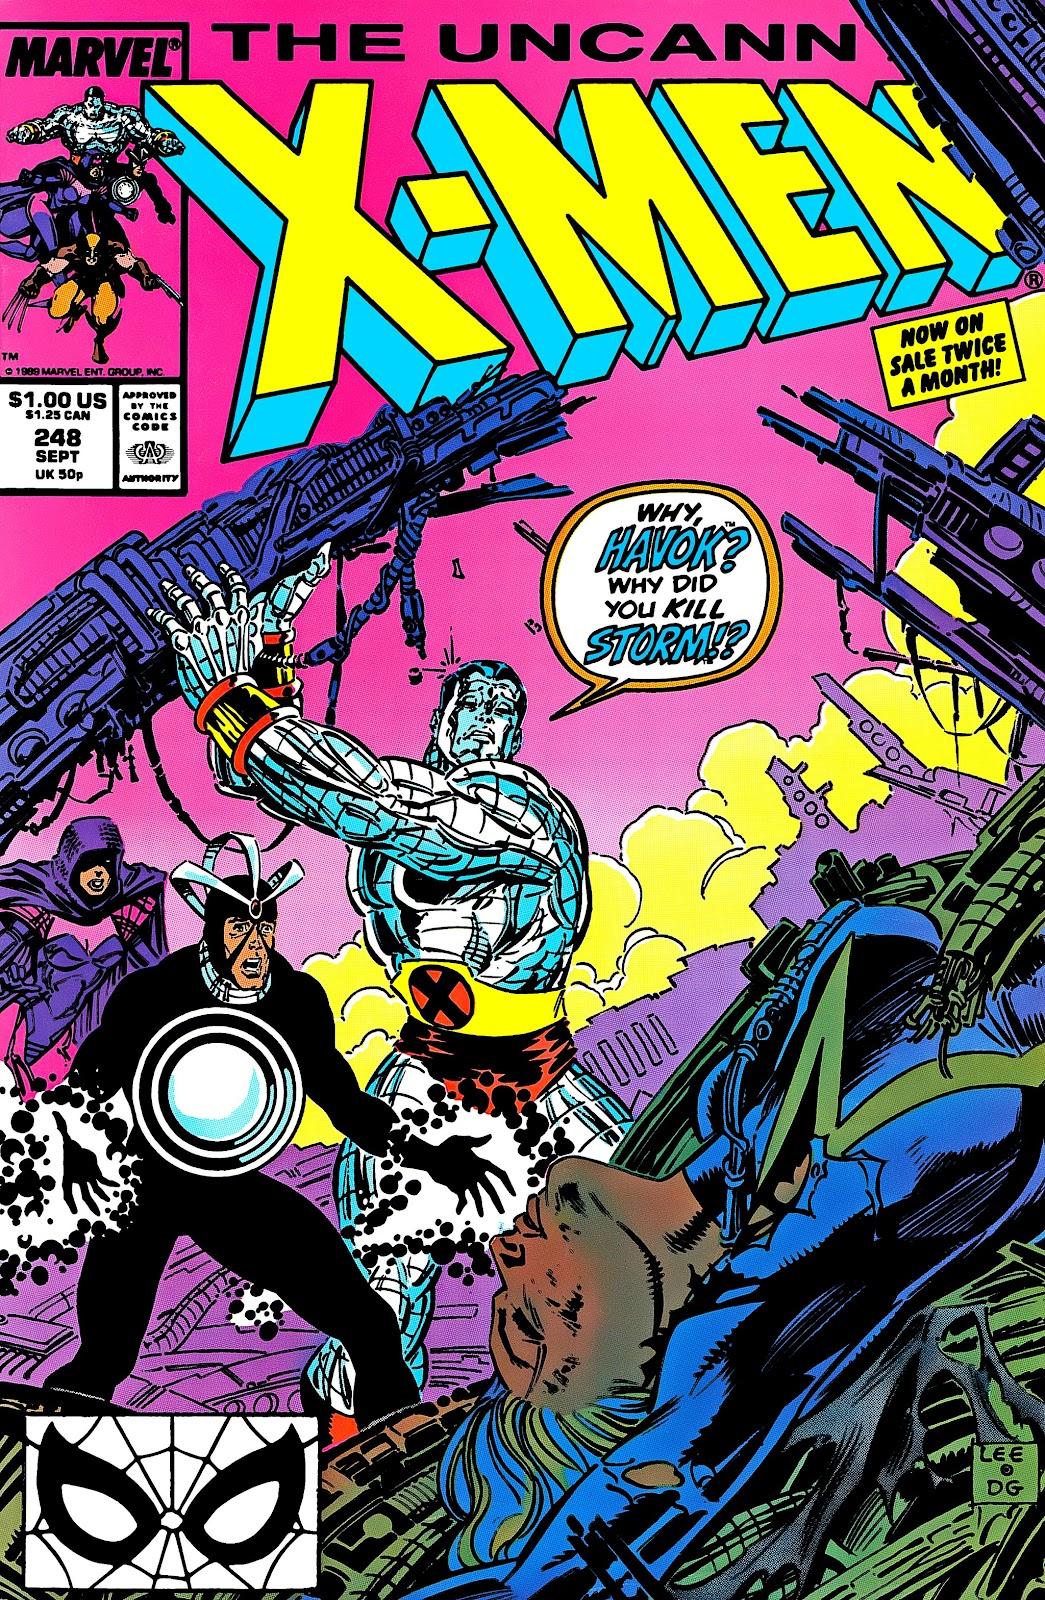 Uncanny X-Men (1963) issue 248 - Page 1